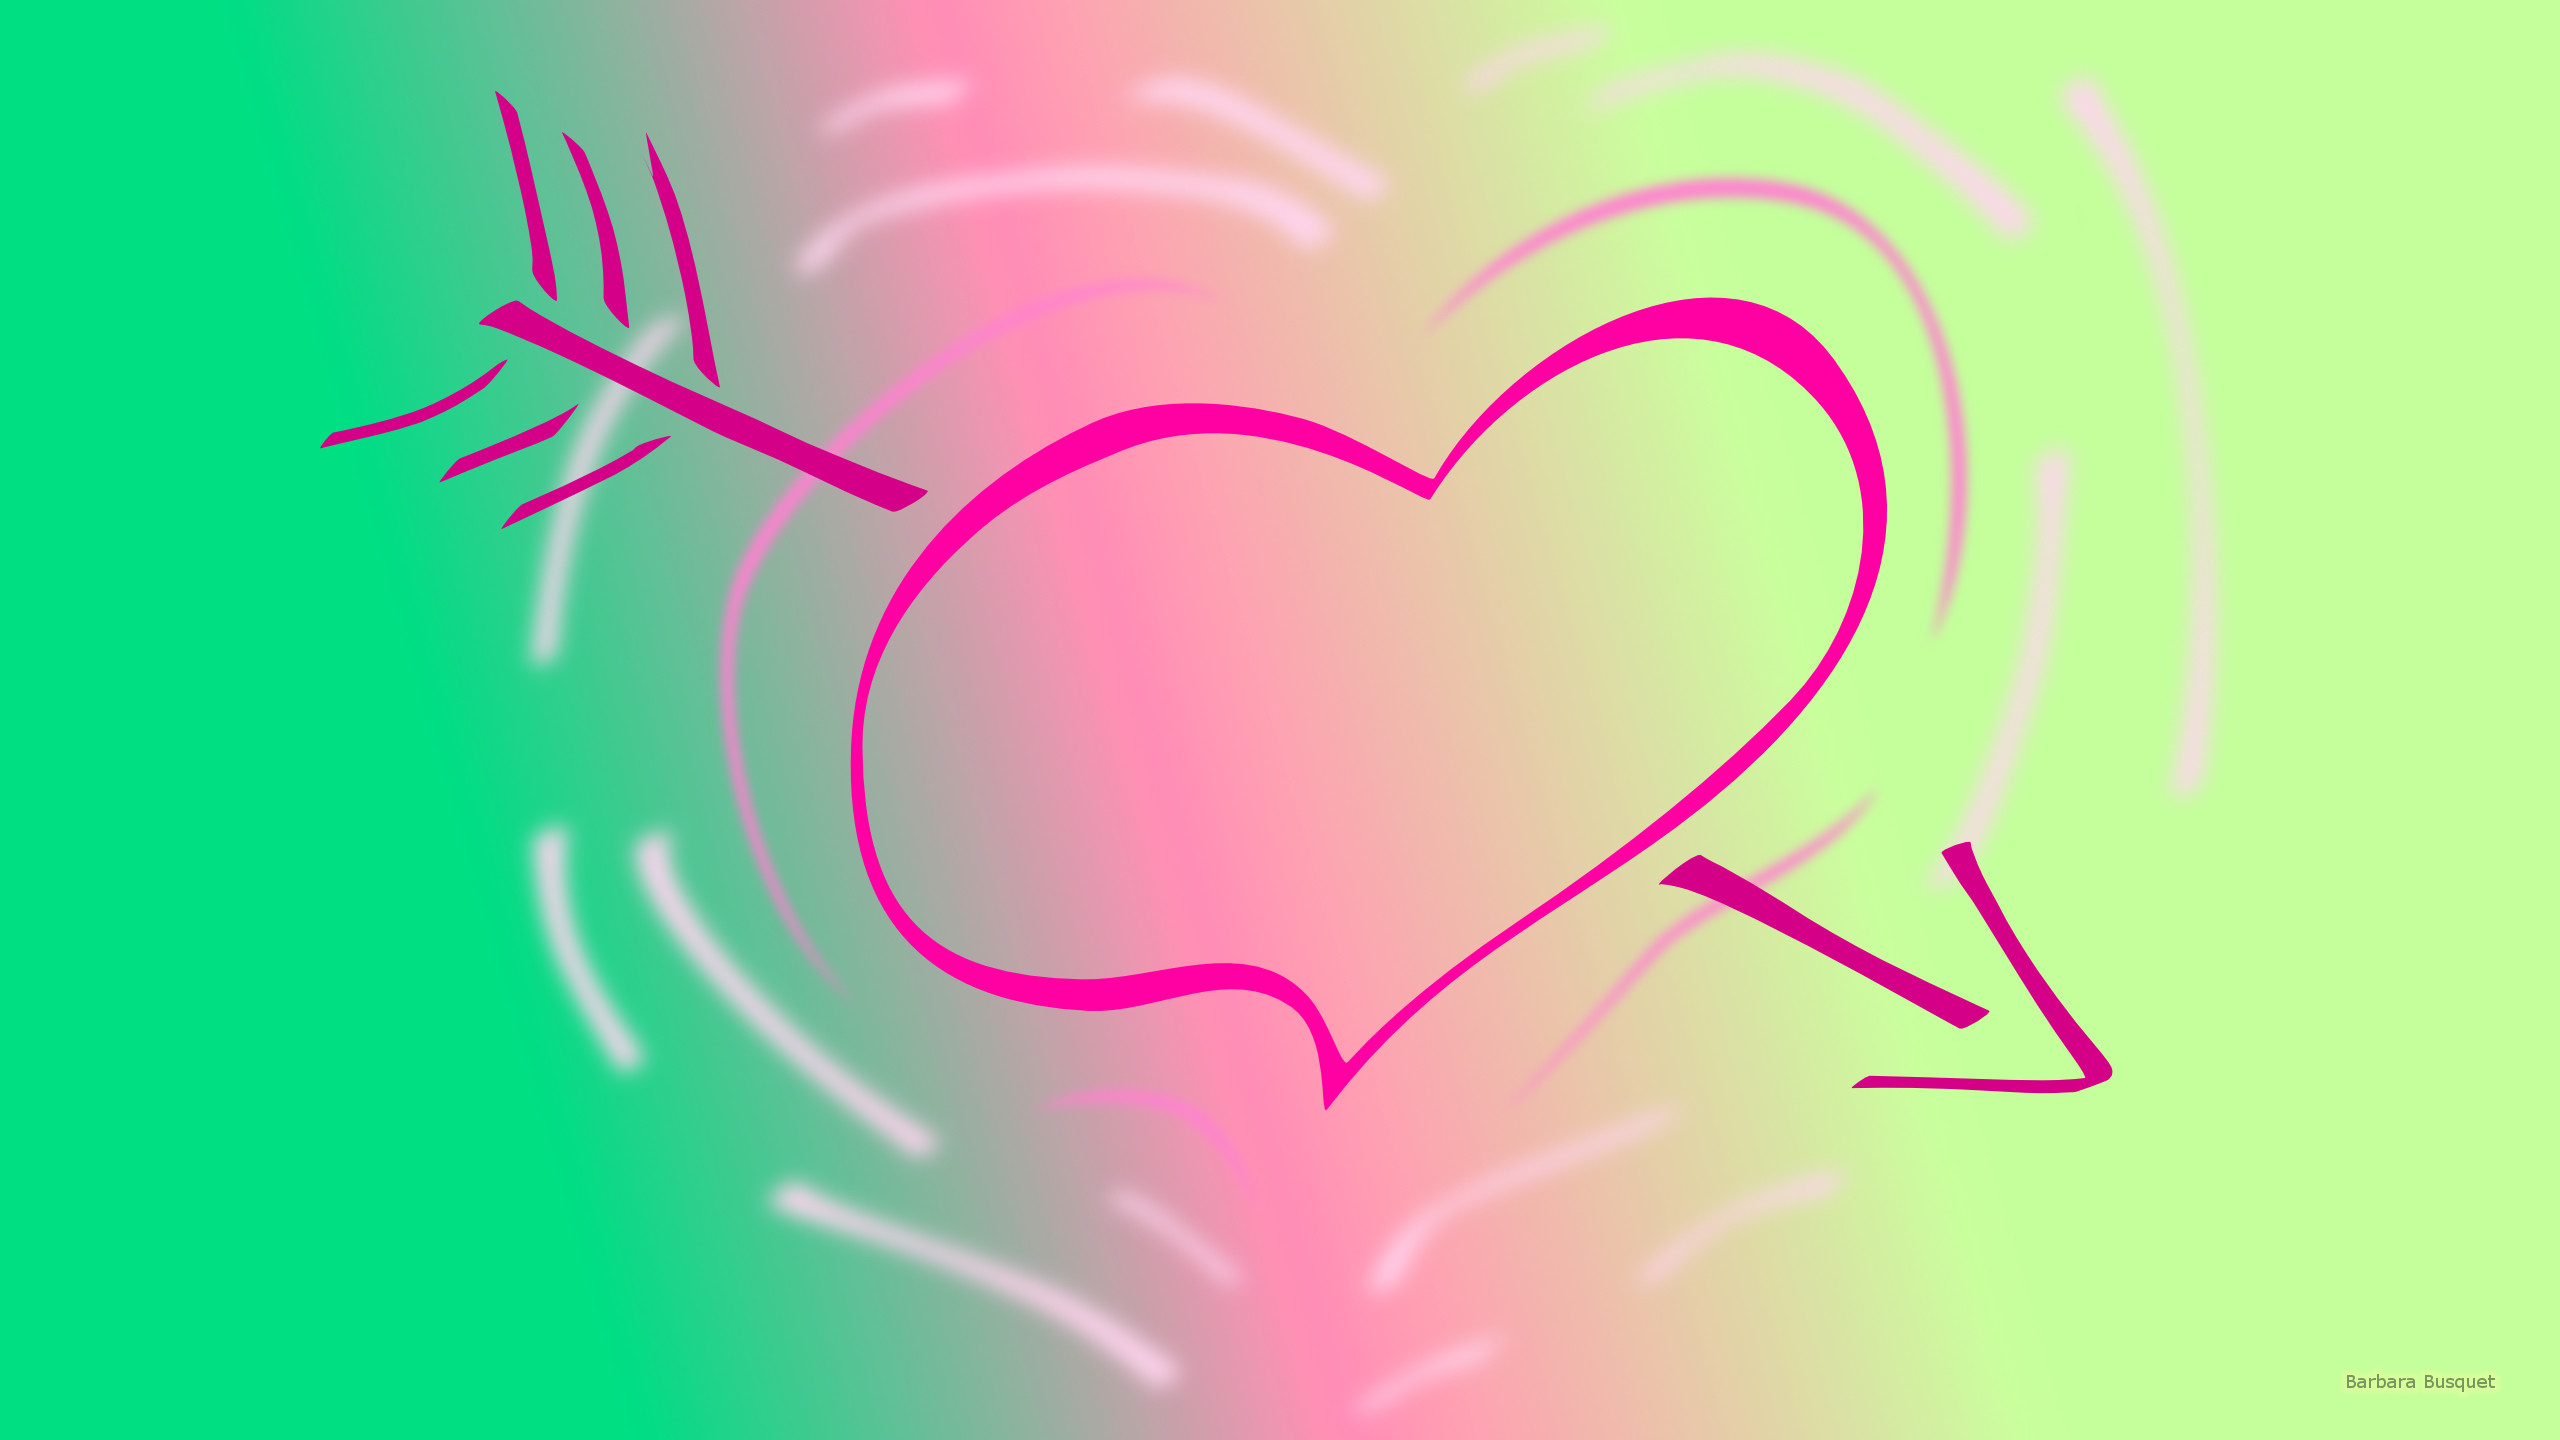 Heart shape backgrounds barbaras hd wallpapers - Heart to heart wallpaper ...